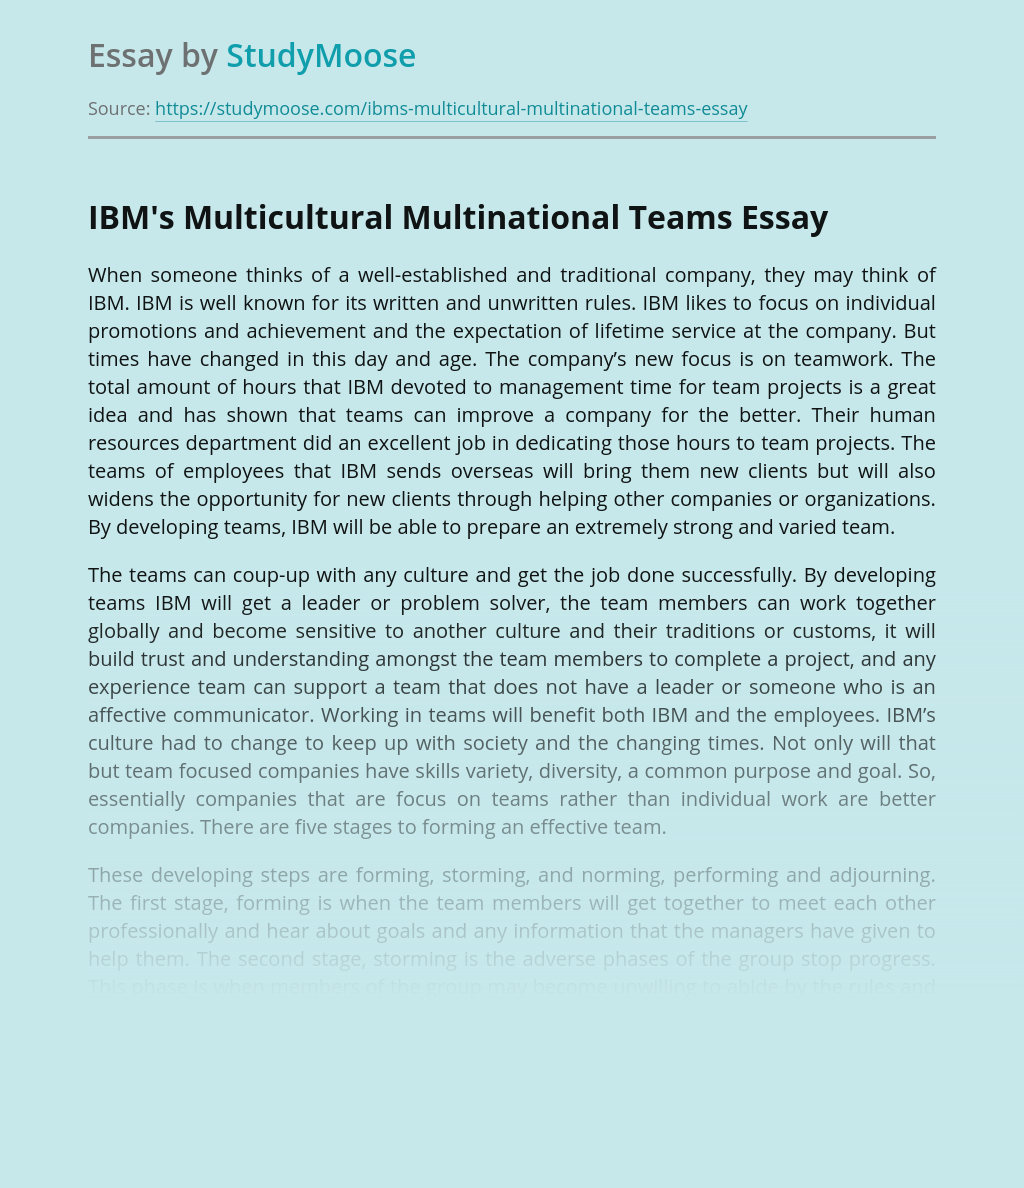 IBM's Multicultural Multinational Teams